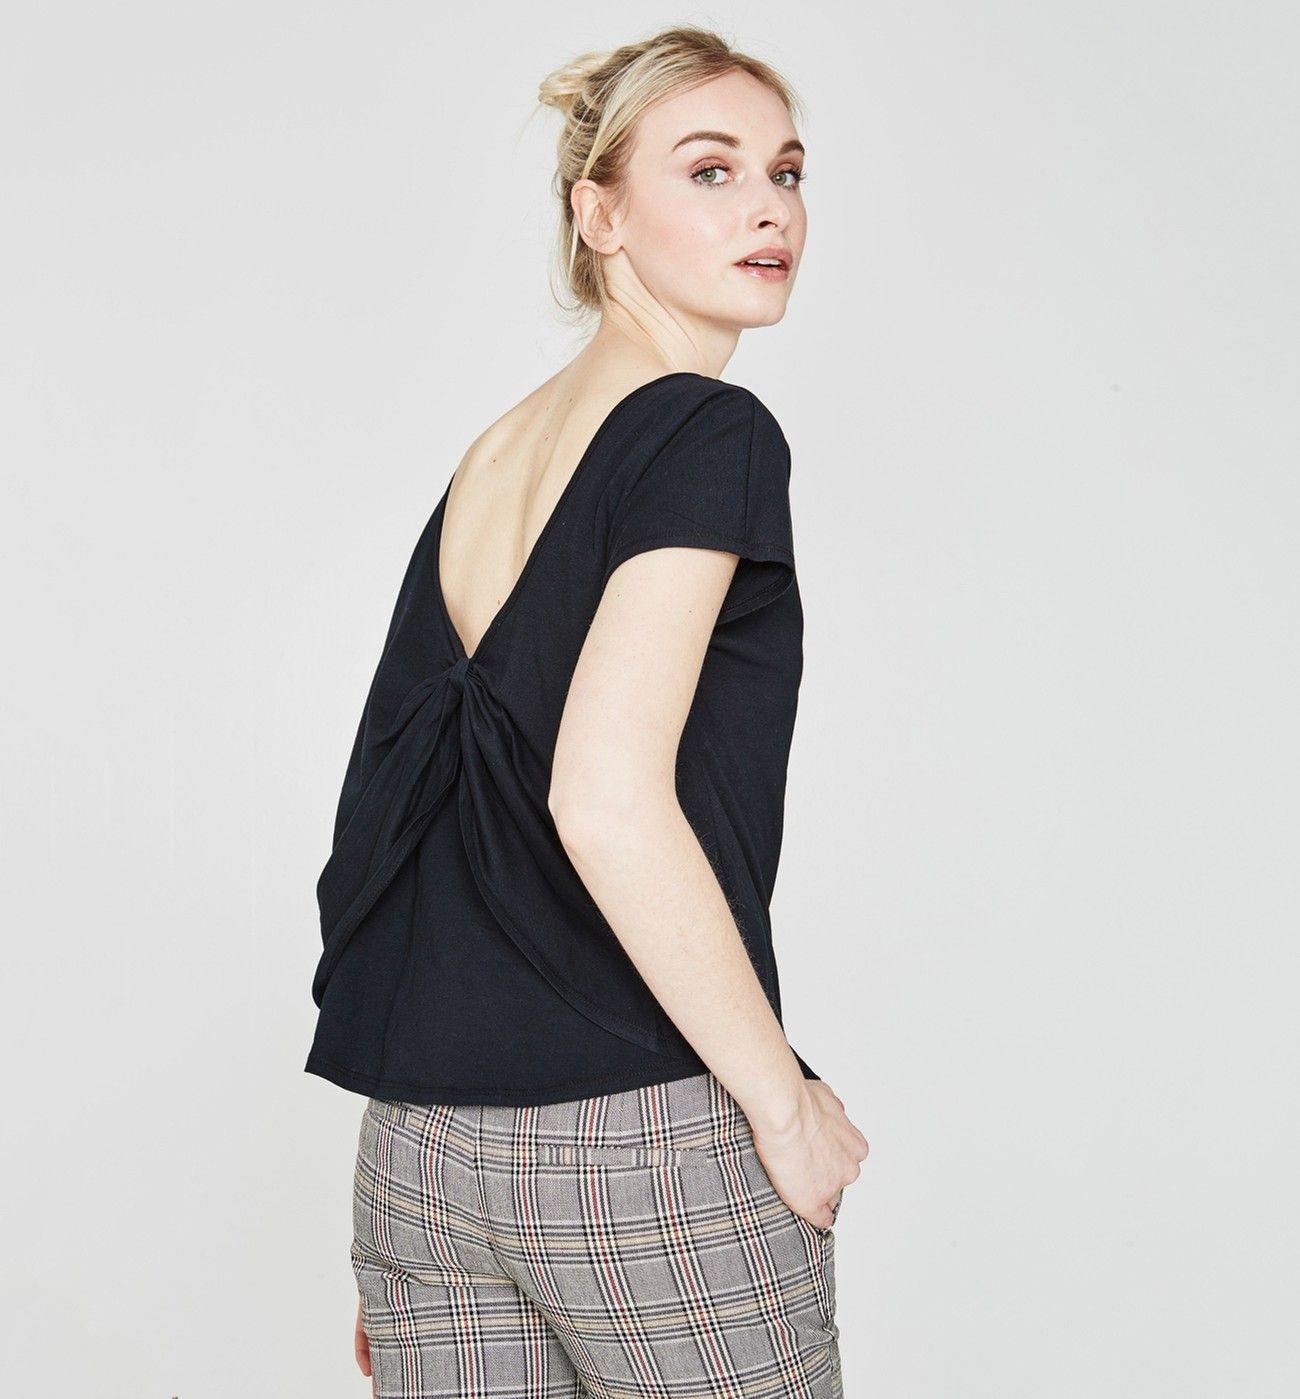 e8ae4fdbbb T-shirt noué dos Femme - Noir - Tops / T-shirts - Femme - Promod ...